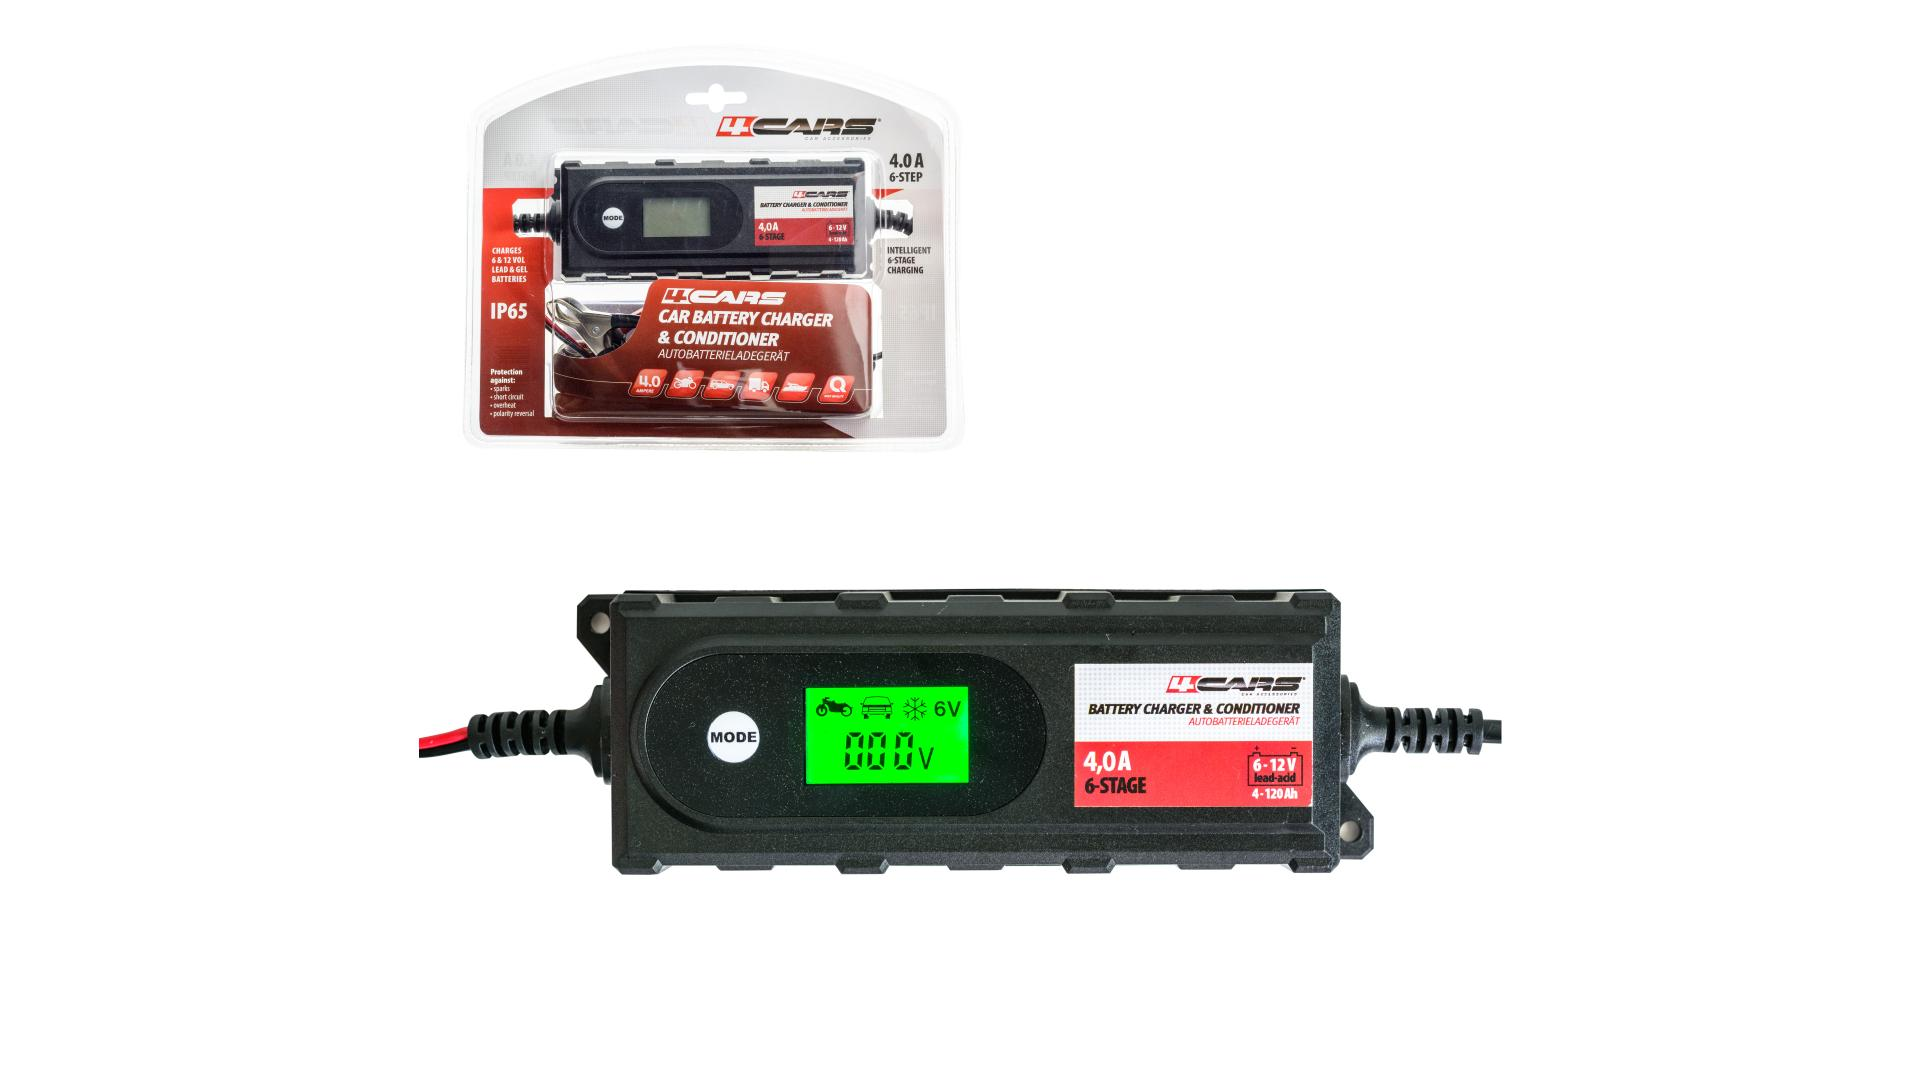 4CARS Inteligentná 6-stupňová nabíjačka-udržiavačka BT-B4.2; 6/12 V; 4,2 A (gelové a tekuté autobatérie)